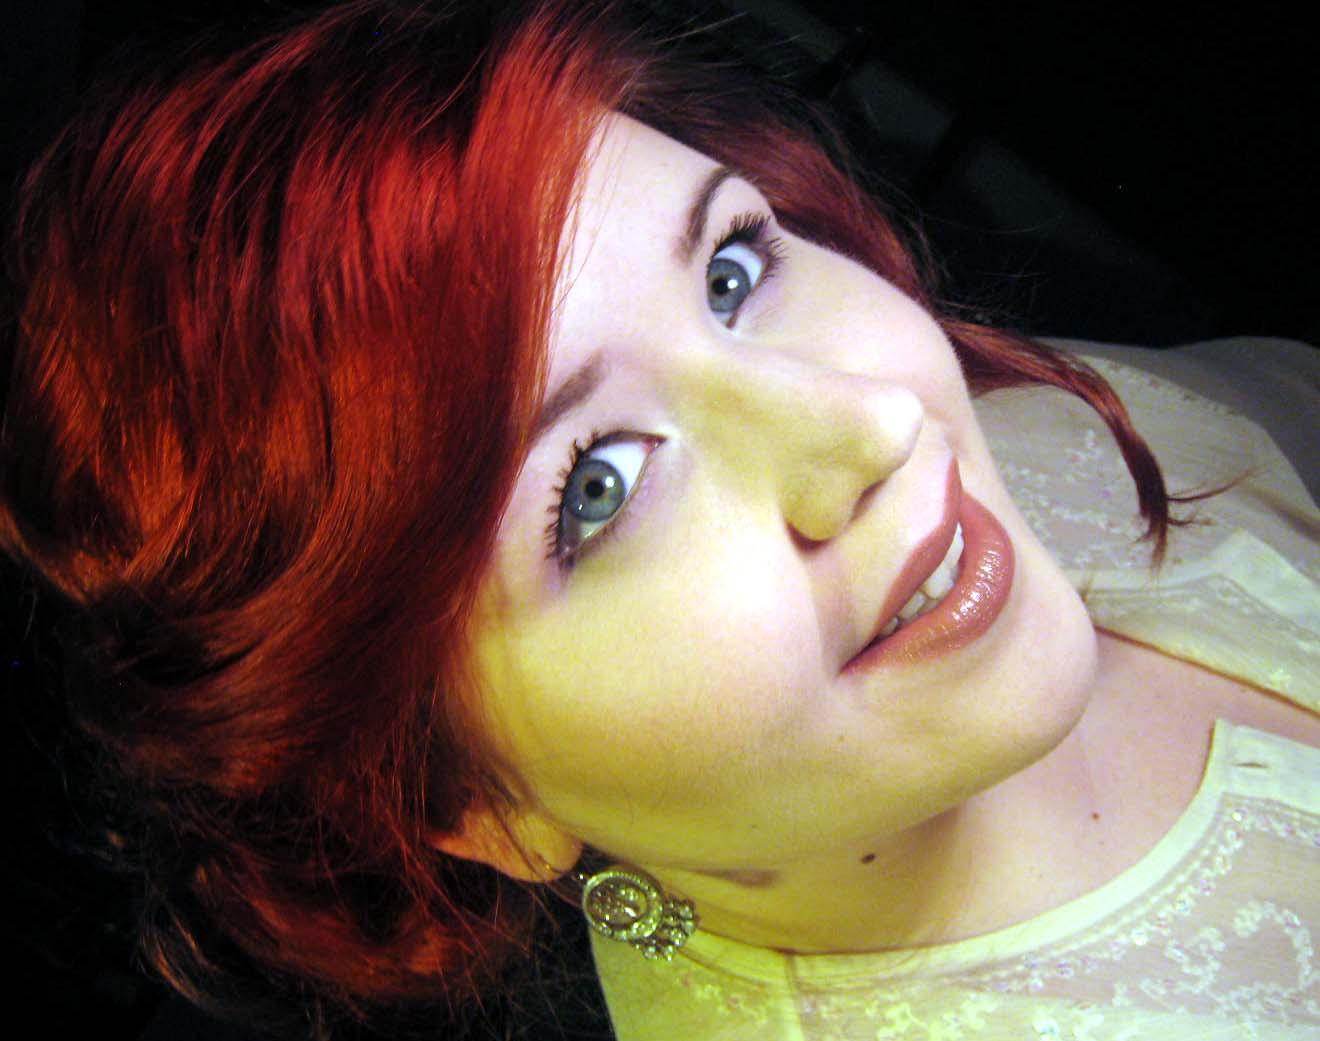 Goldiestarlings Art Of Beauty Blog Quick Run Down Of Hair Dye And